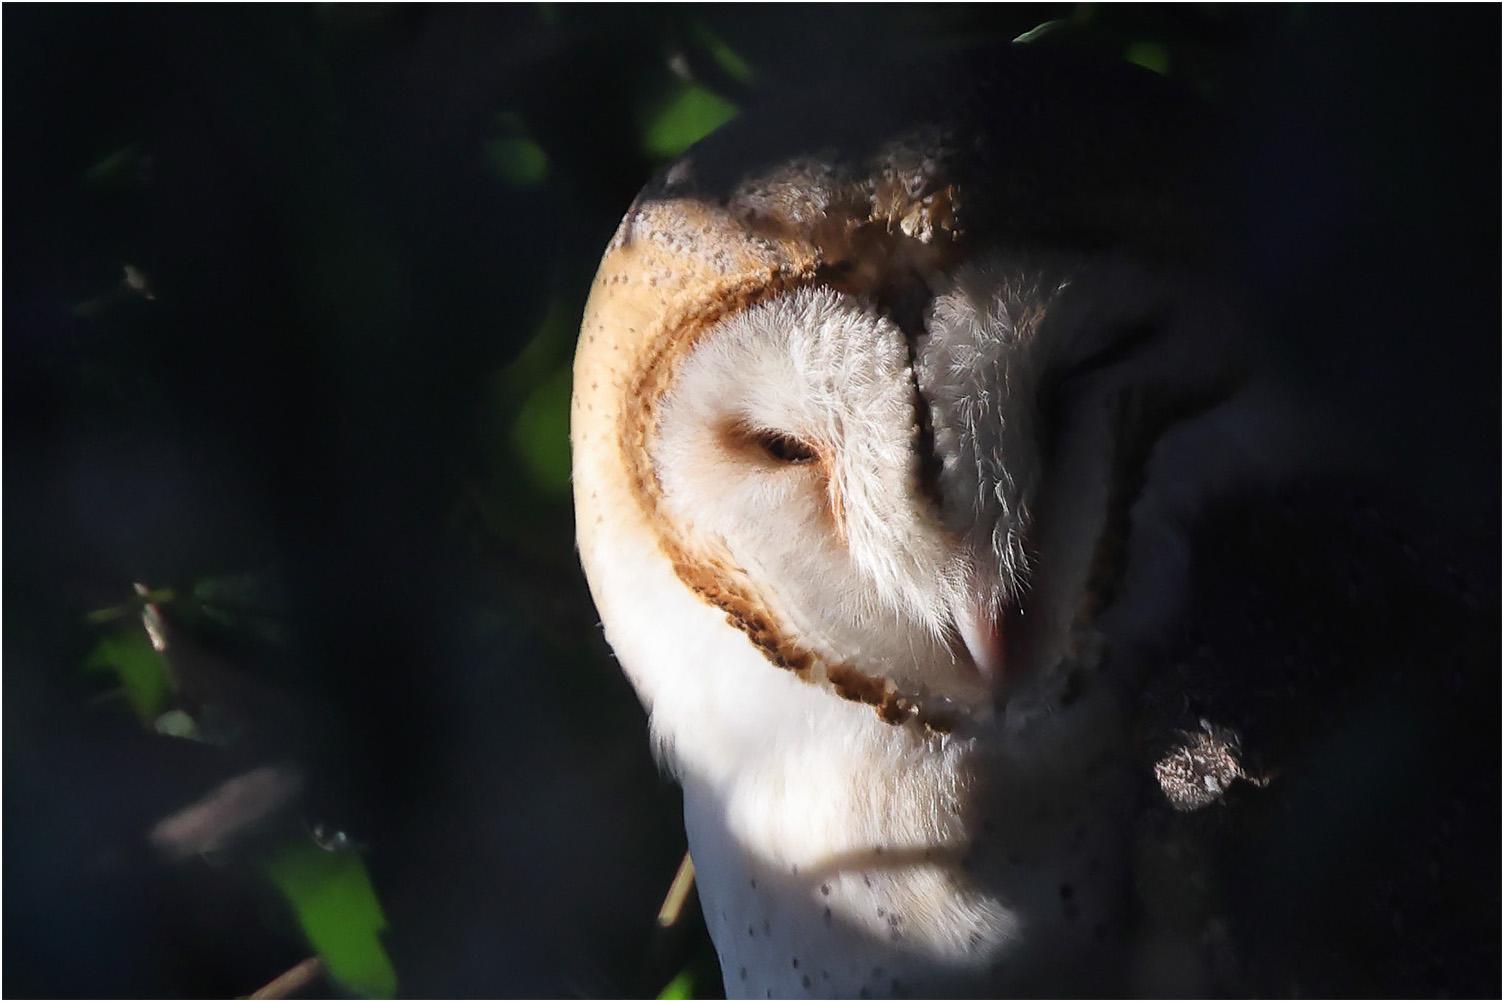 Tornuggla (Barn Owl) vid Skanörs kyrka i Skåne